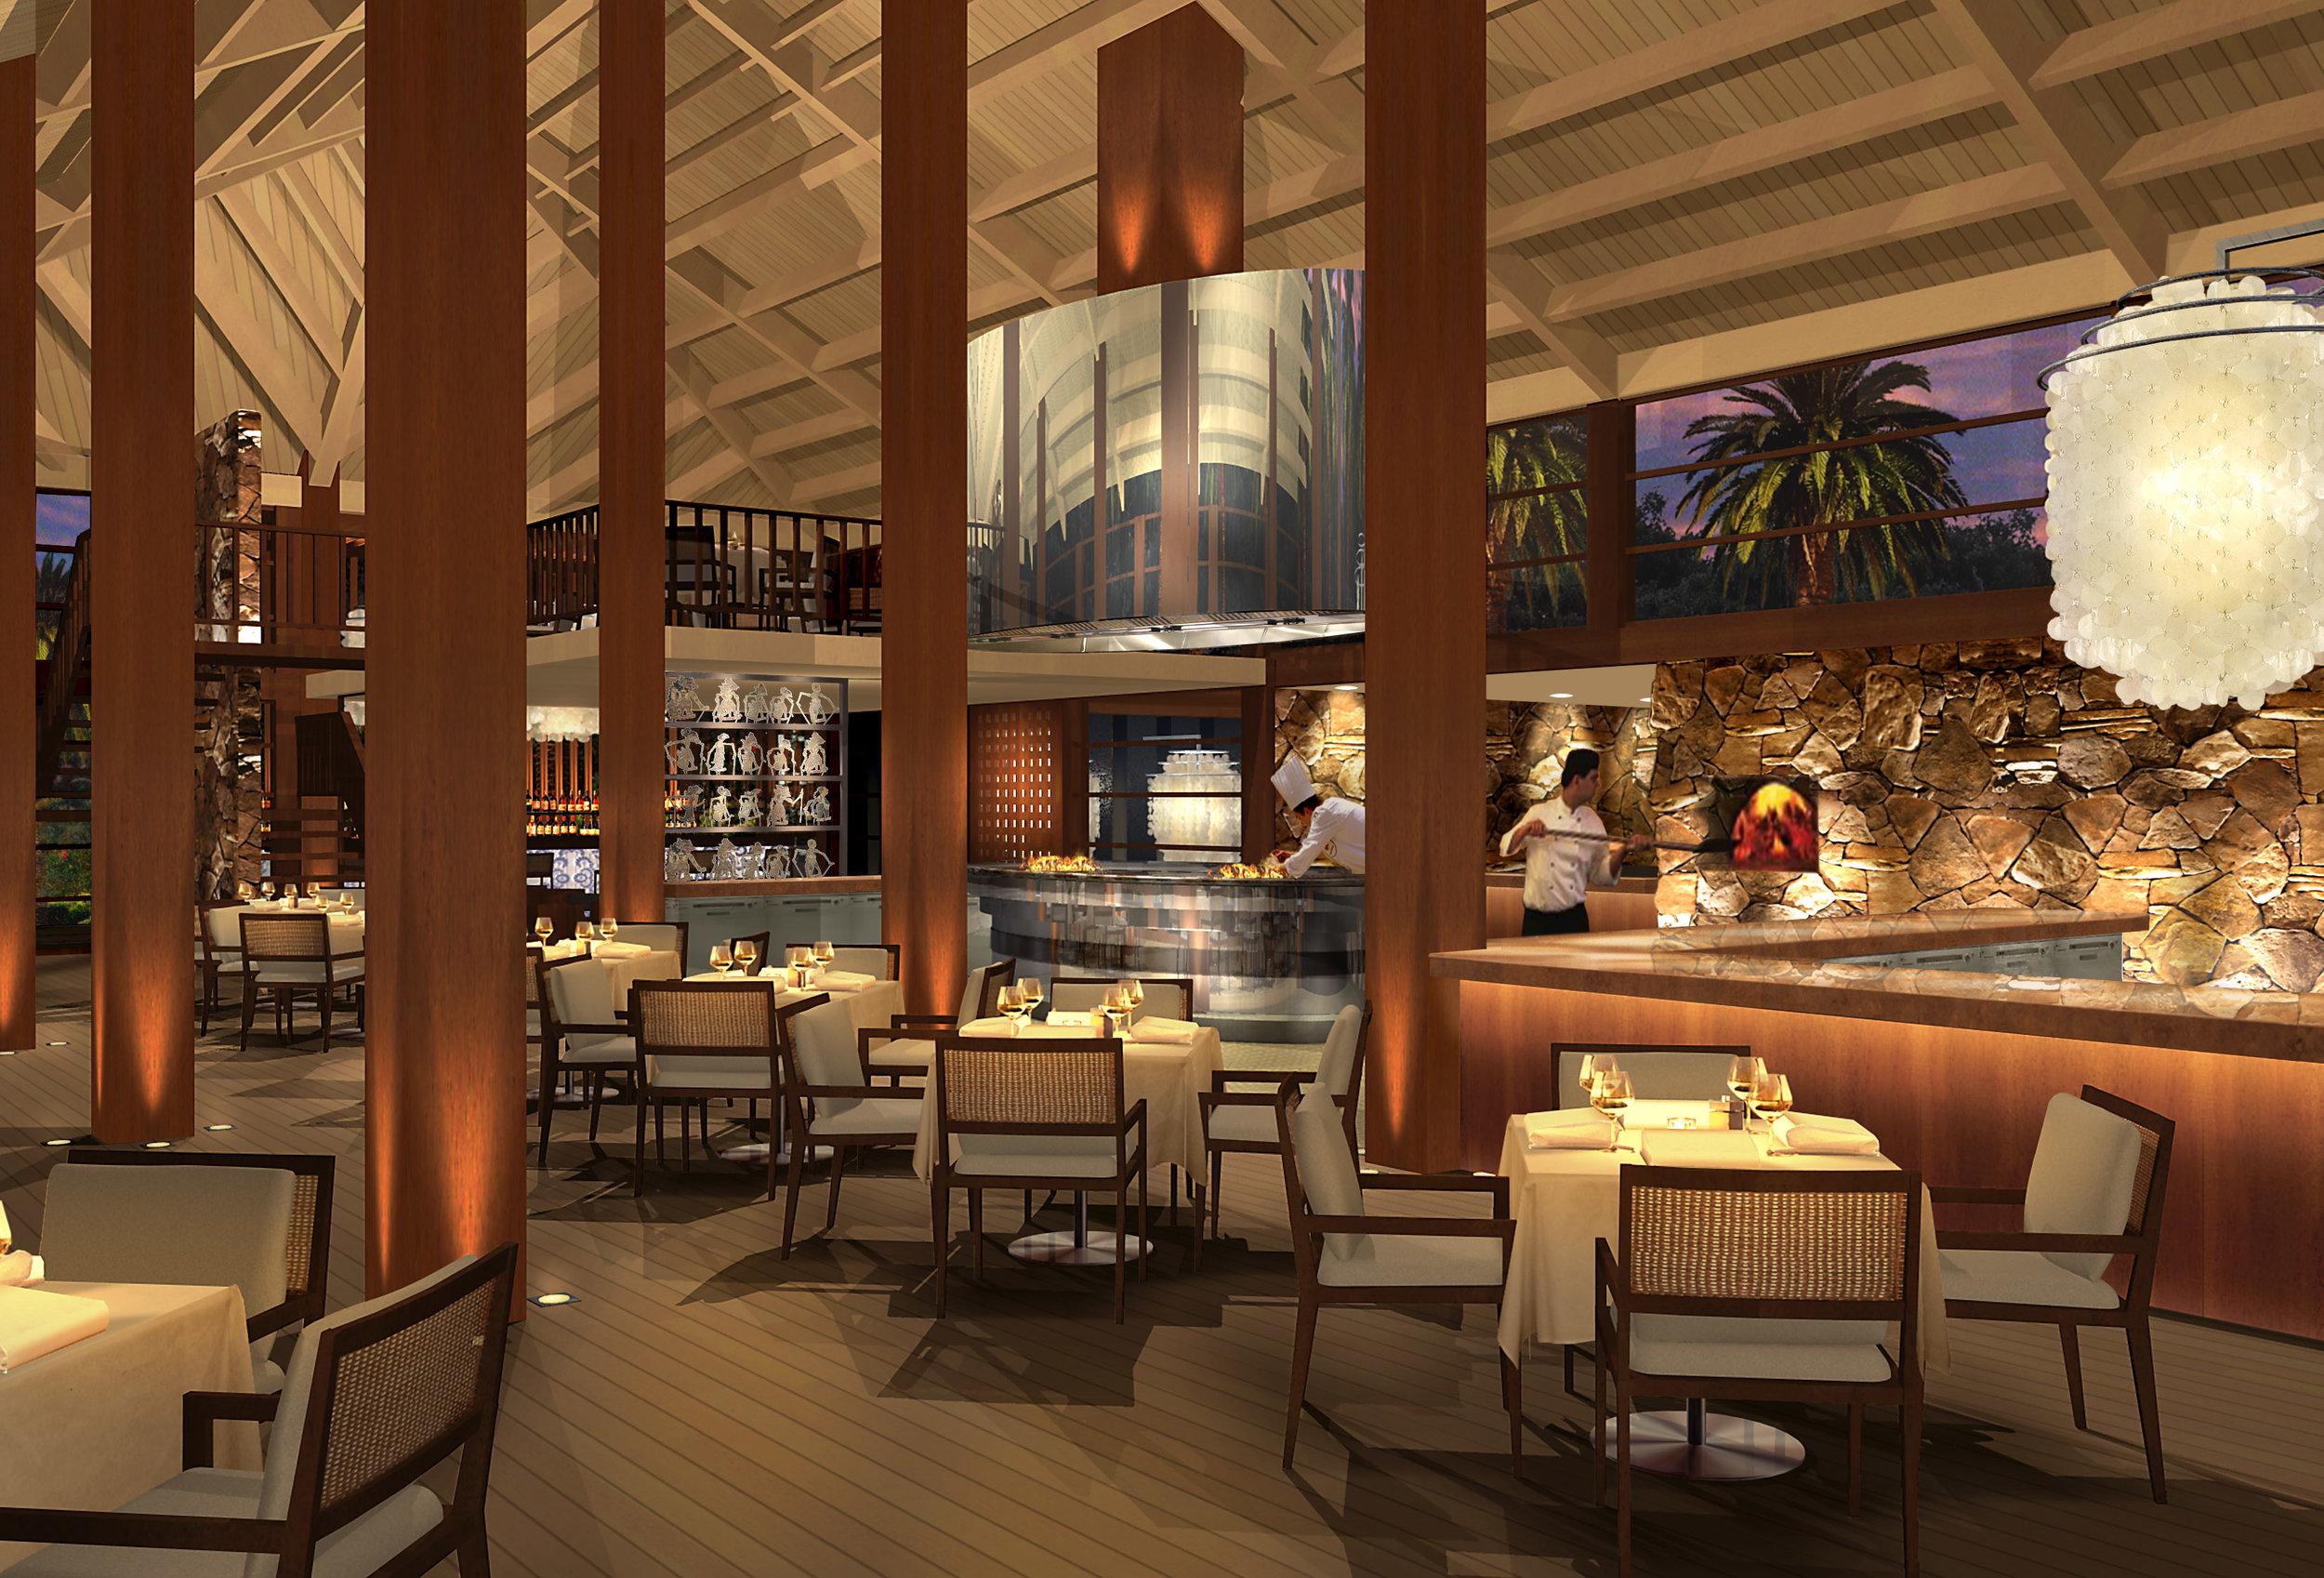 putih restaurant interior.jpg